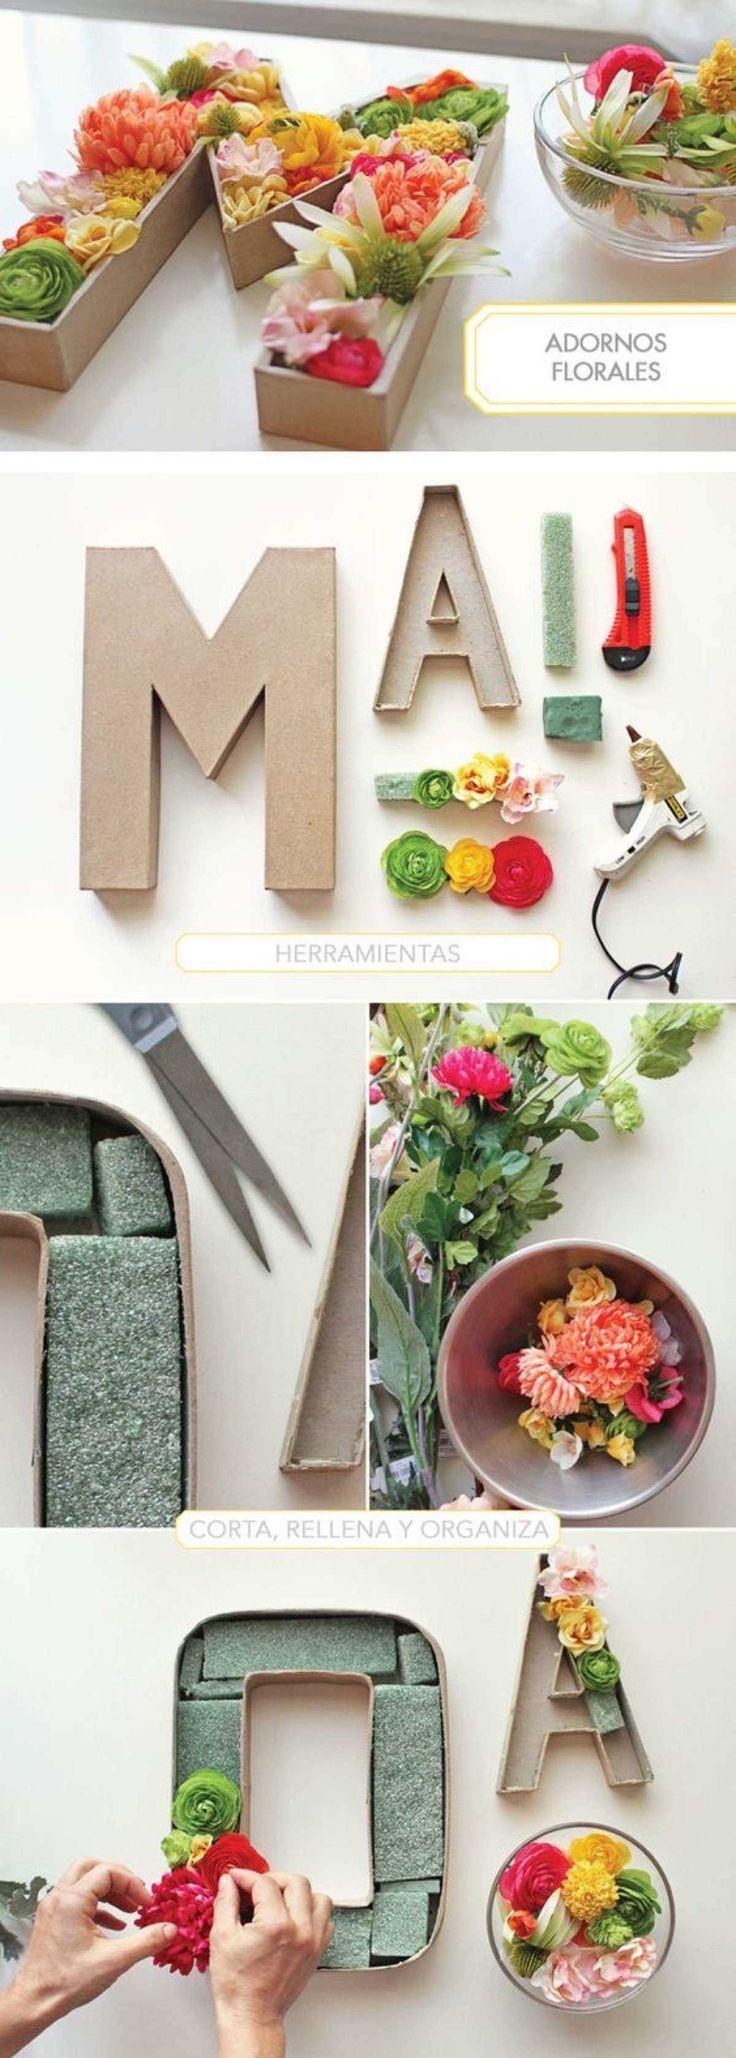 1000 ideas about s monogram on pinterest initials - Letras para decorar ...